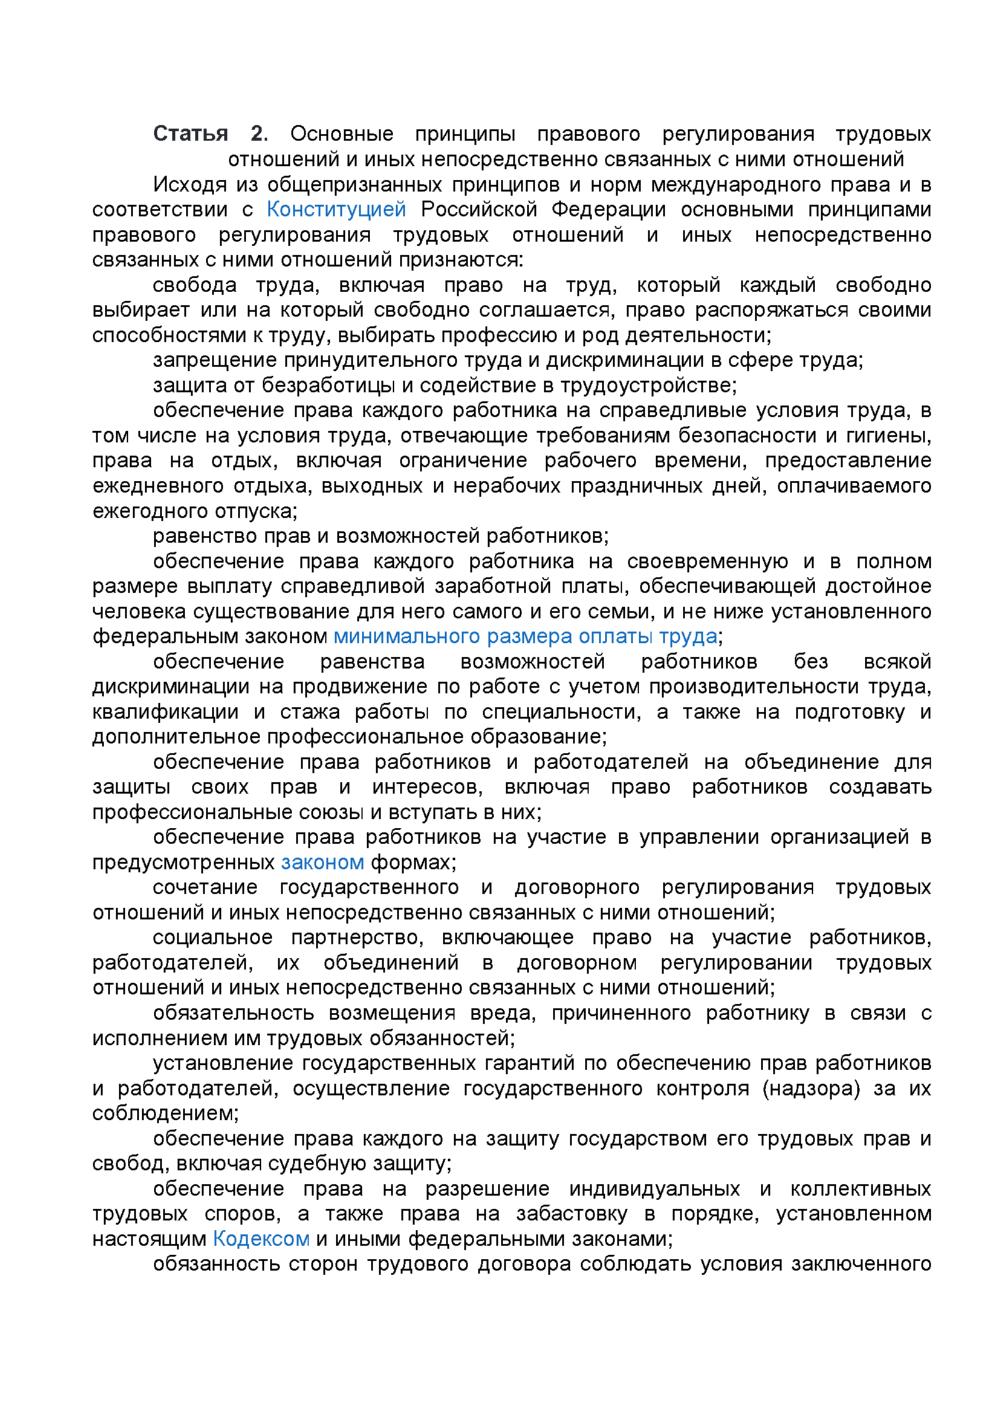 http://i1.imageban.ru/out/2013/11/04/1958595e0f17856852f724063053c4d2.jpg